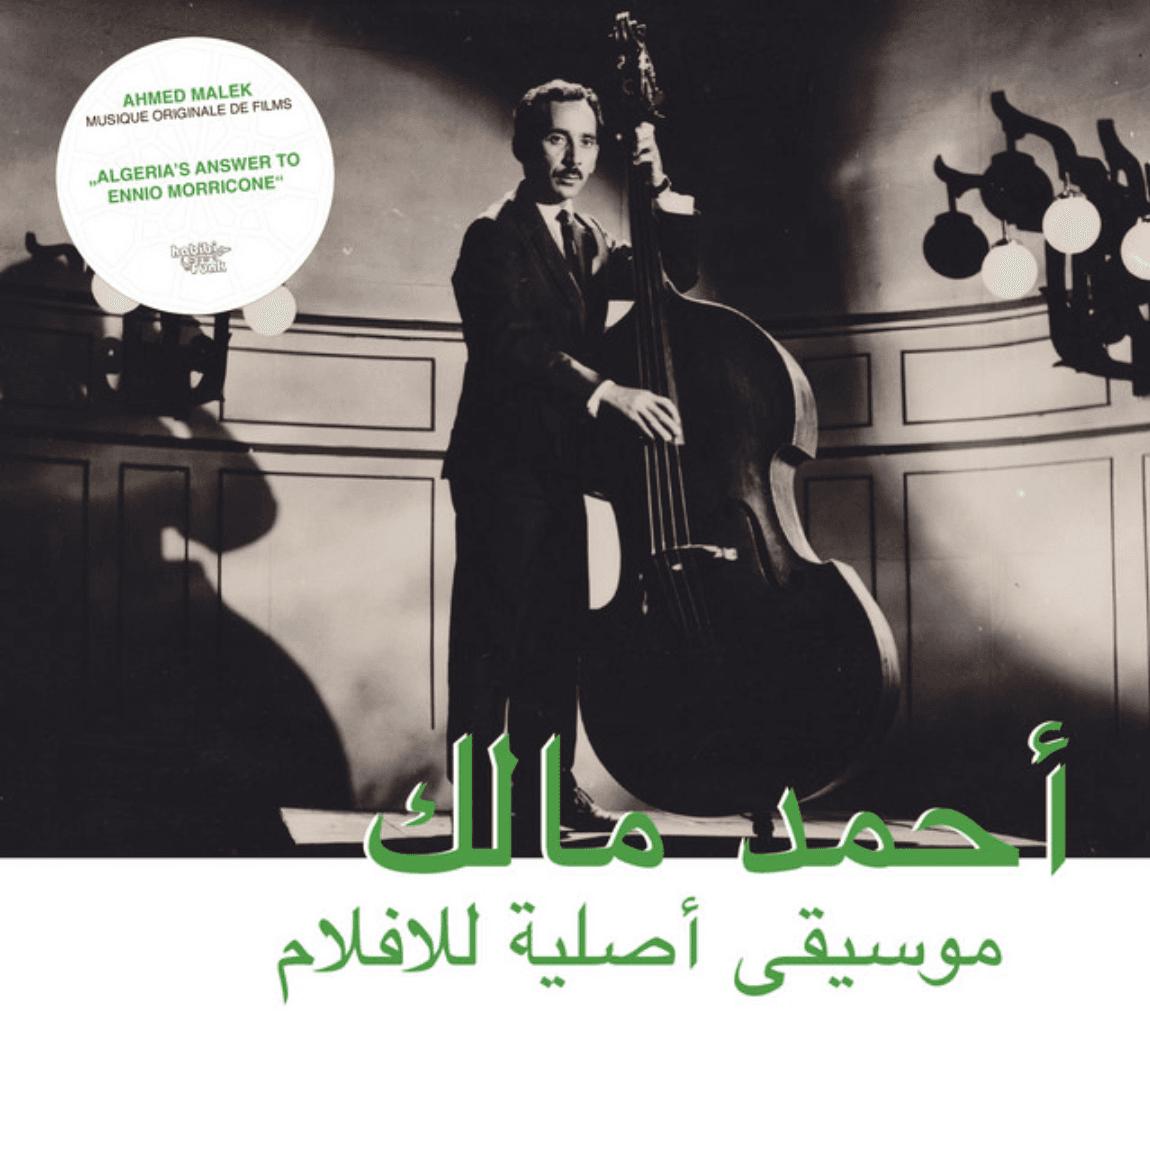 playlist of songs by Ahmad Malek